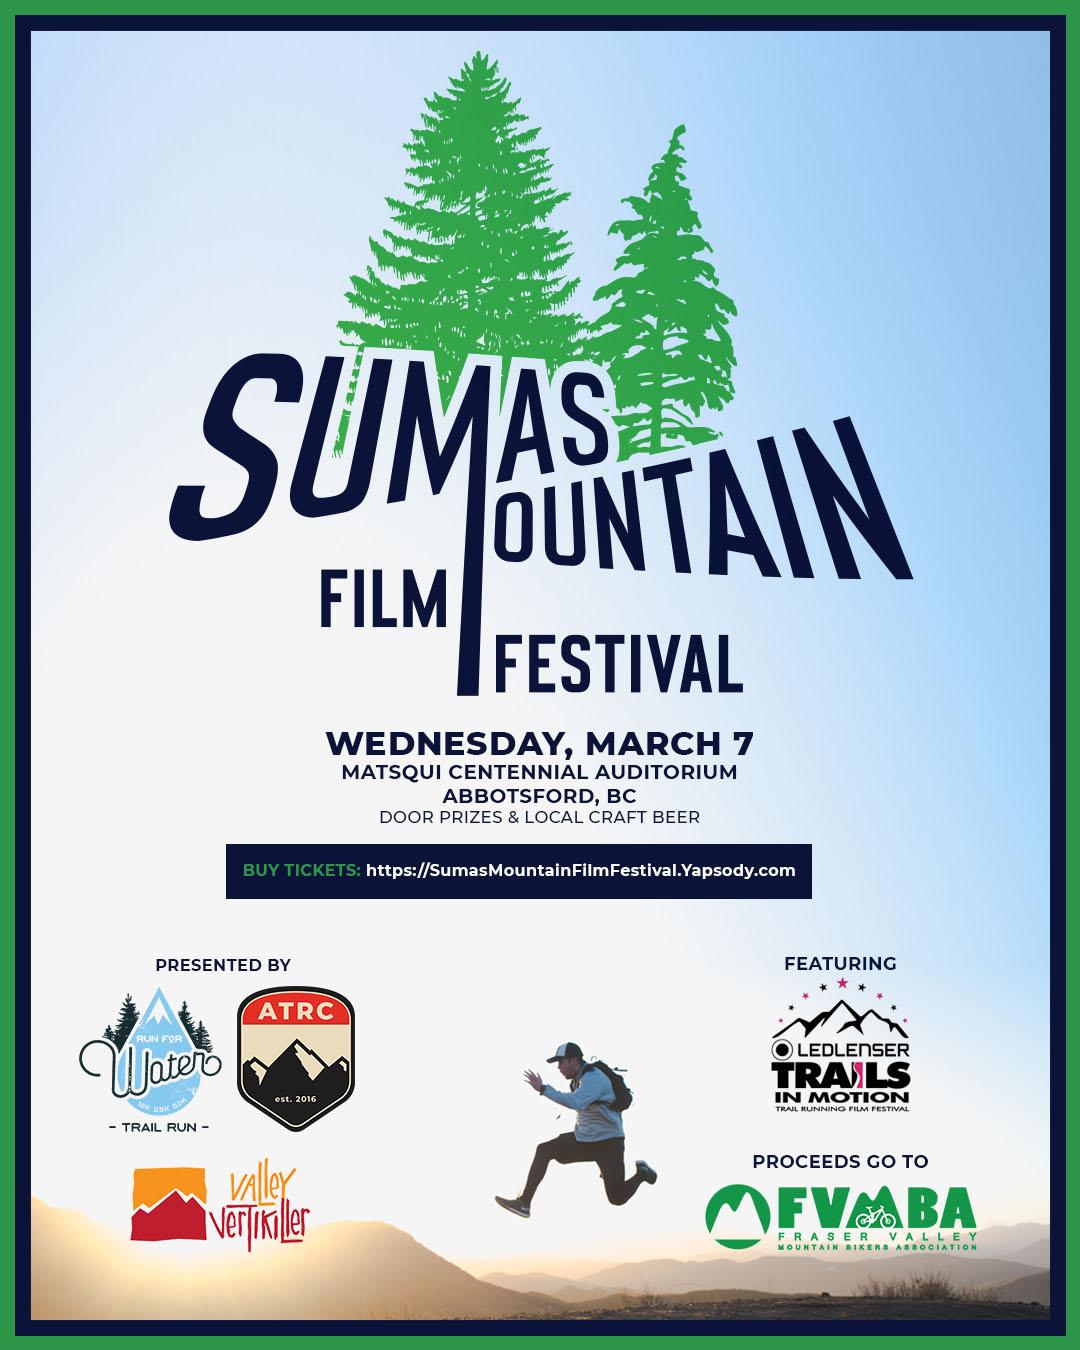 Sumas Mountain Film Festival, Wednesday, March 7